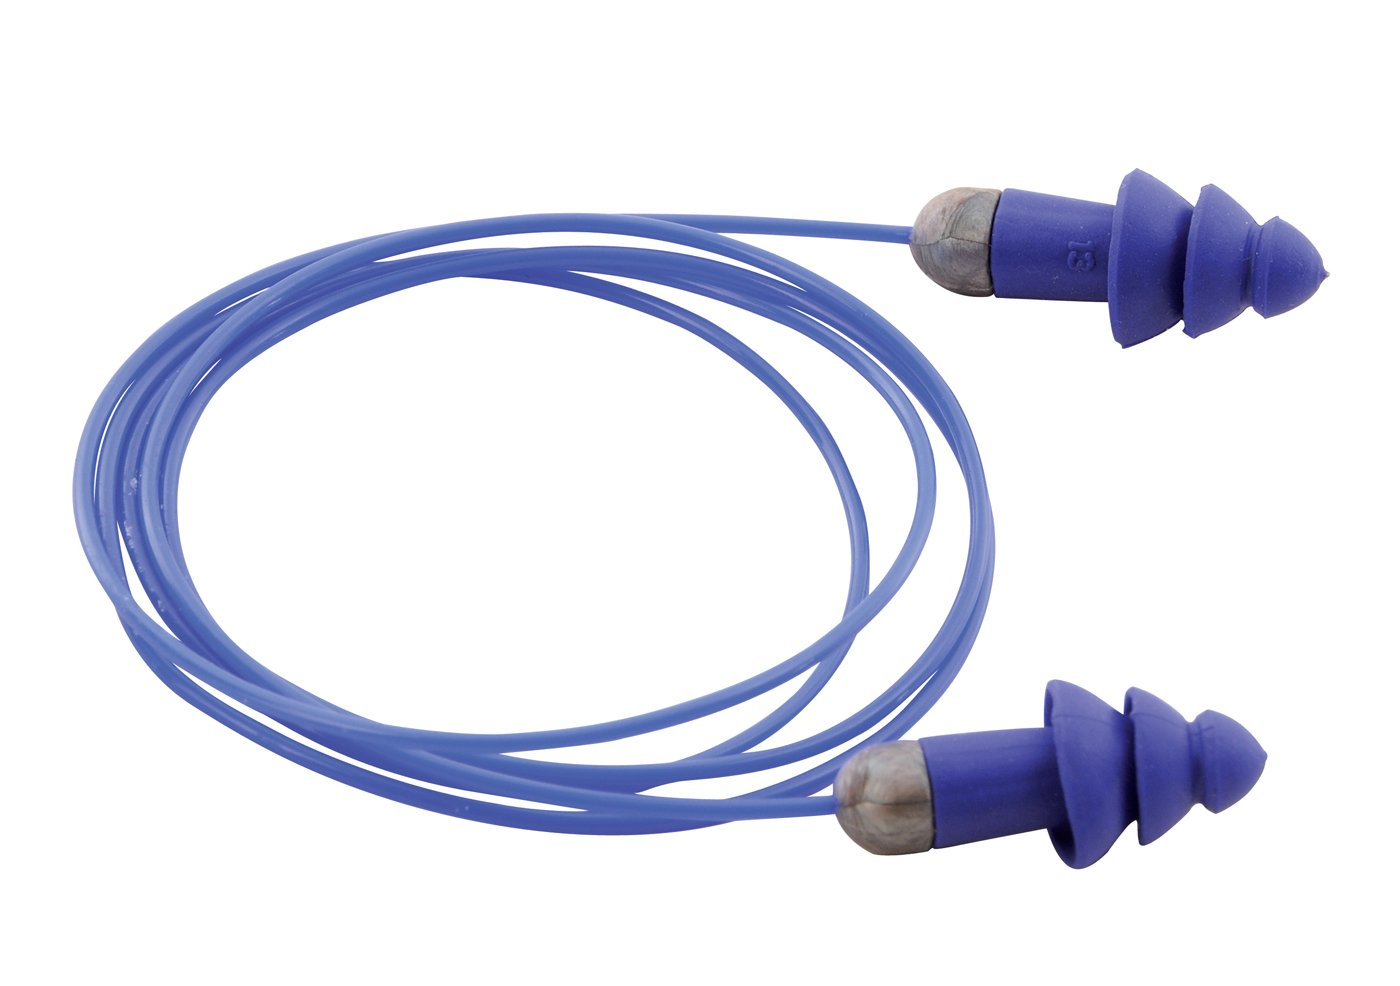 Moldex M6415 Rockets Corded Earplugs, Detectable  (50 per Dispenser)